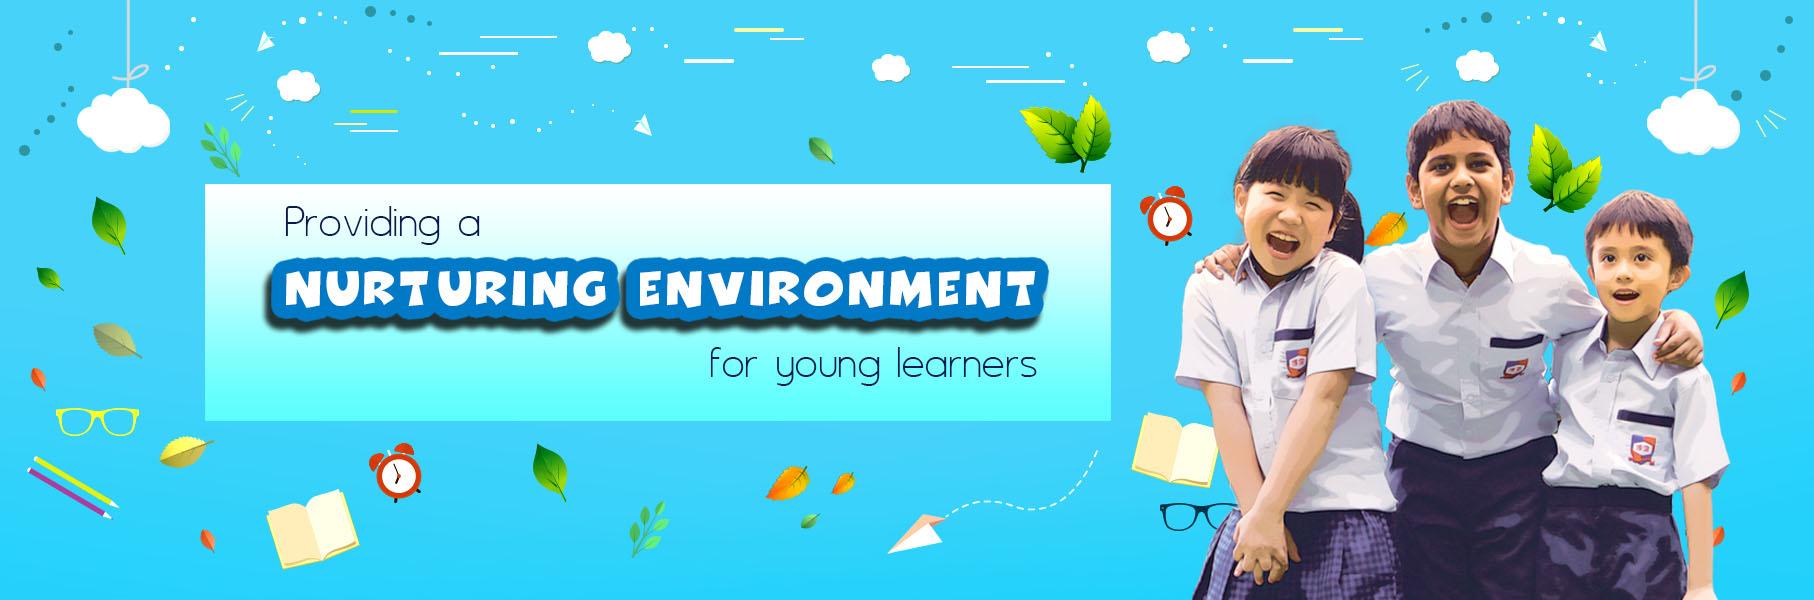 https://dimensions.edu.sg/landing/wp-content/uploads/2017/07/primary-school-singapore.jpg